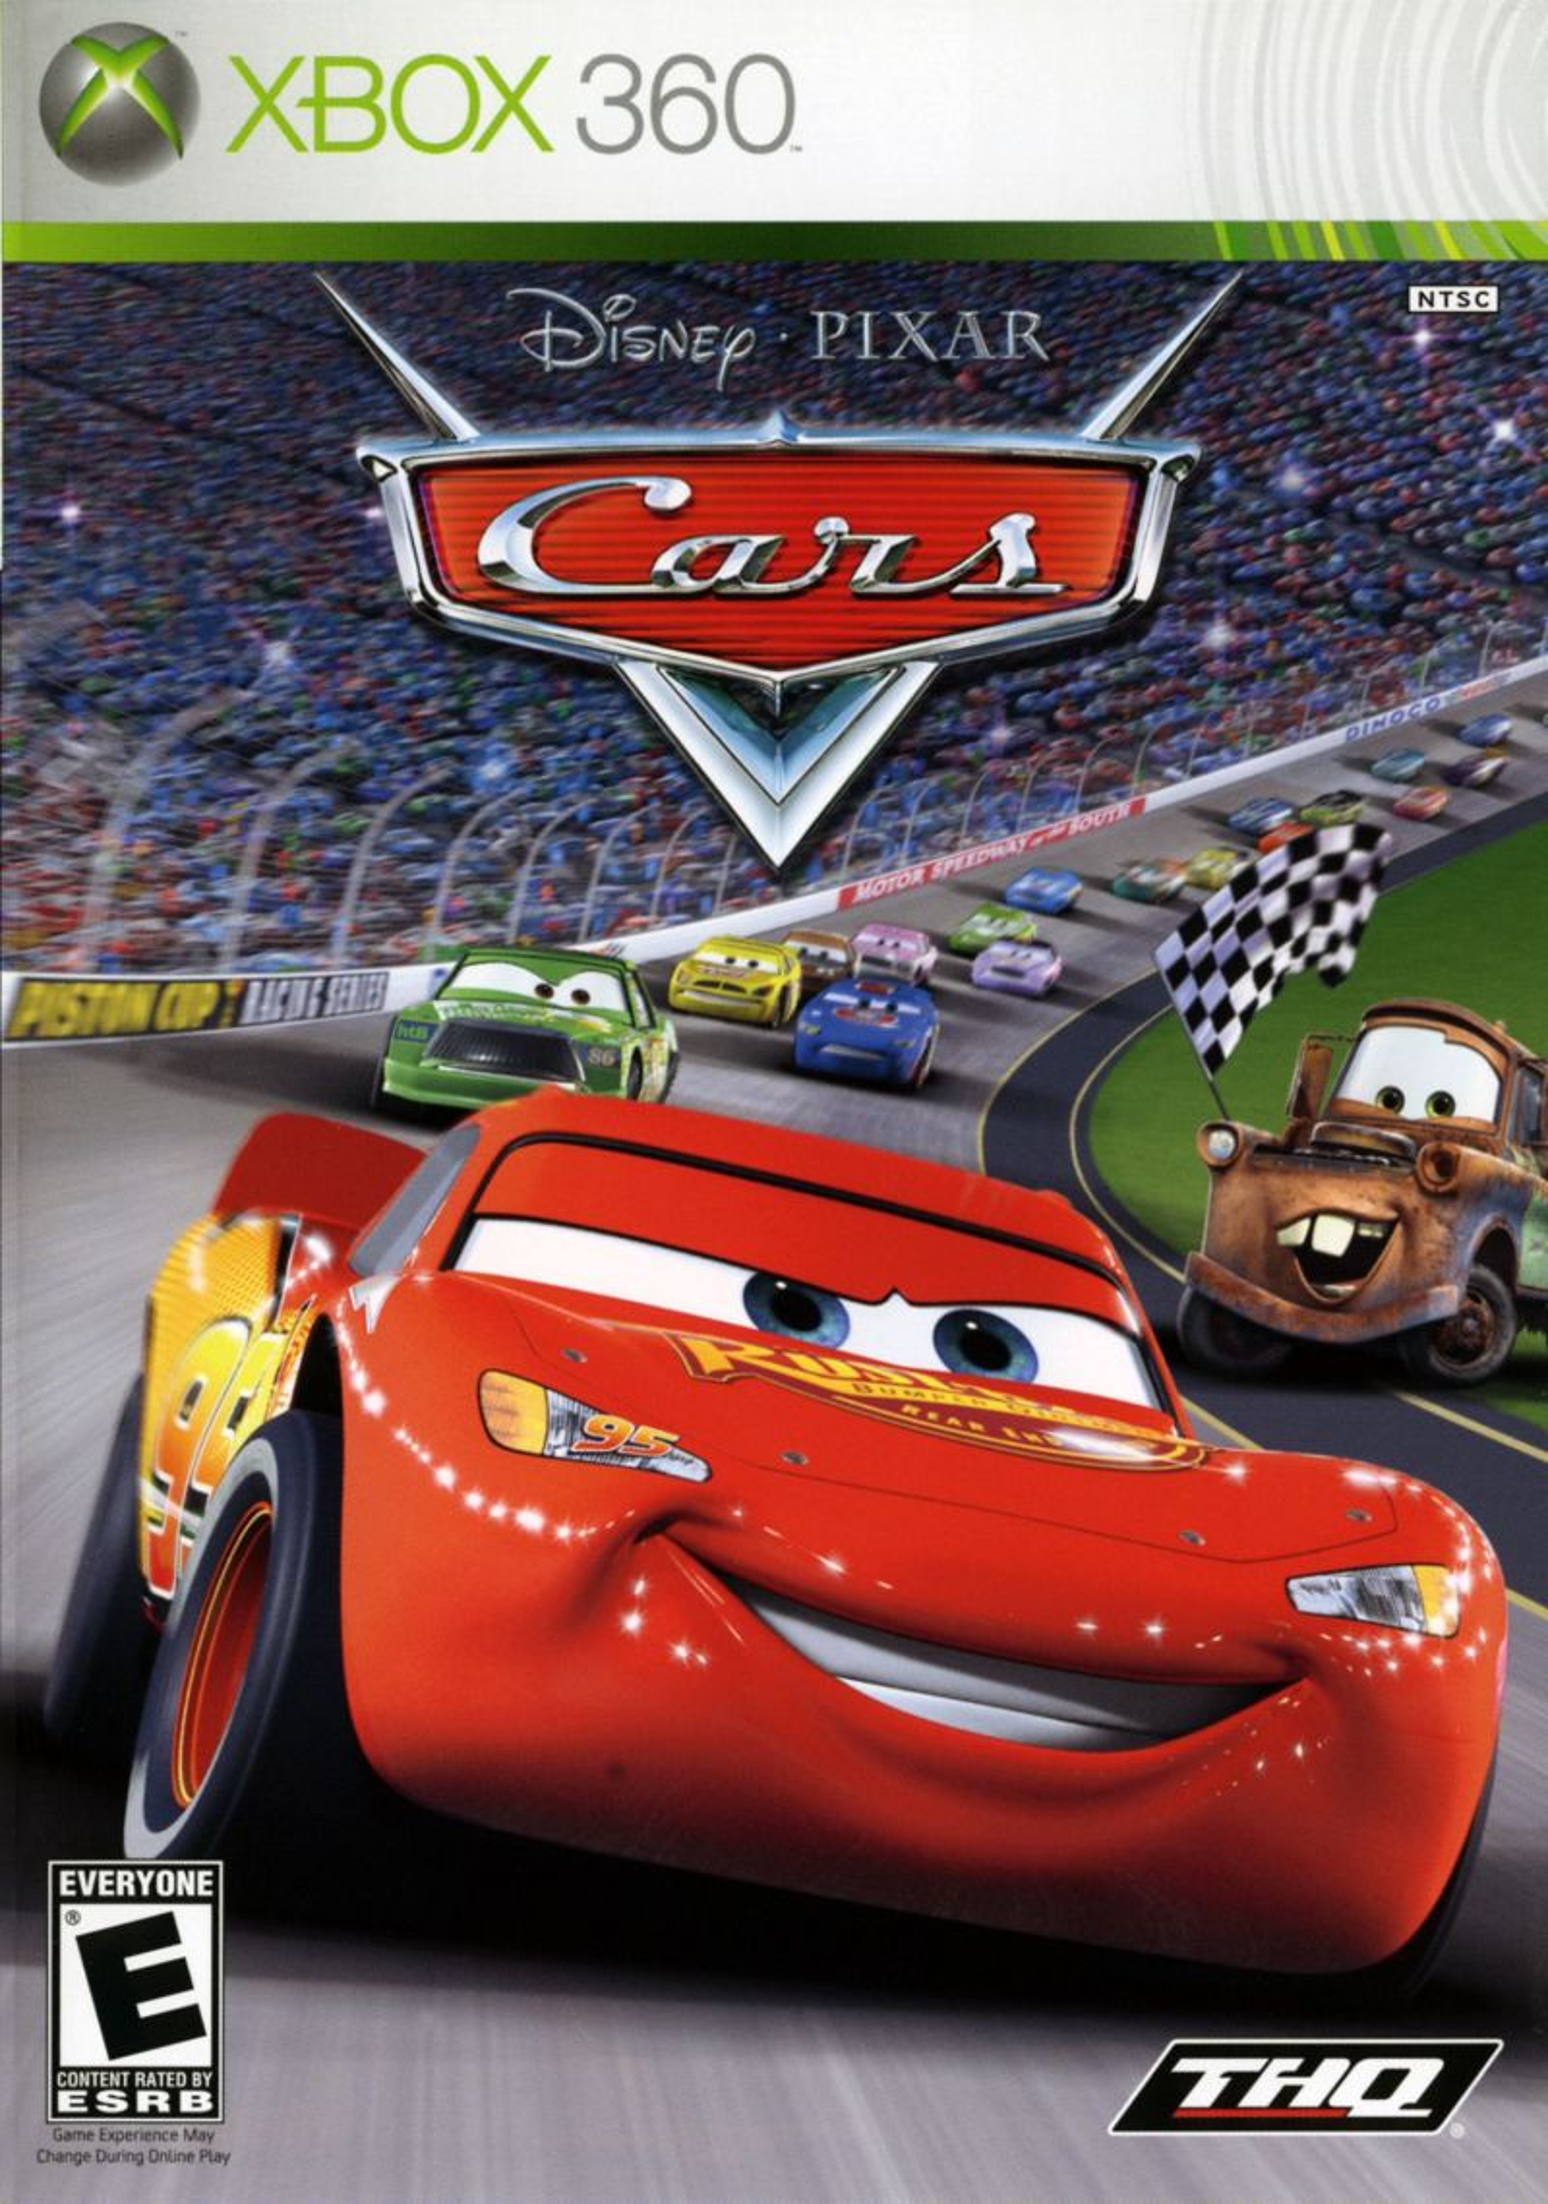 Category:Cars Video Games | Pixar Wiki | FANDOM powered by Wikia